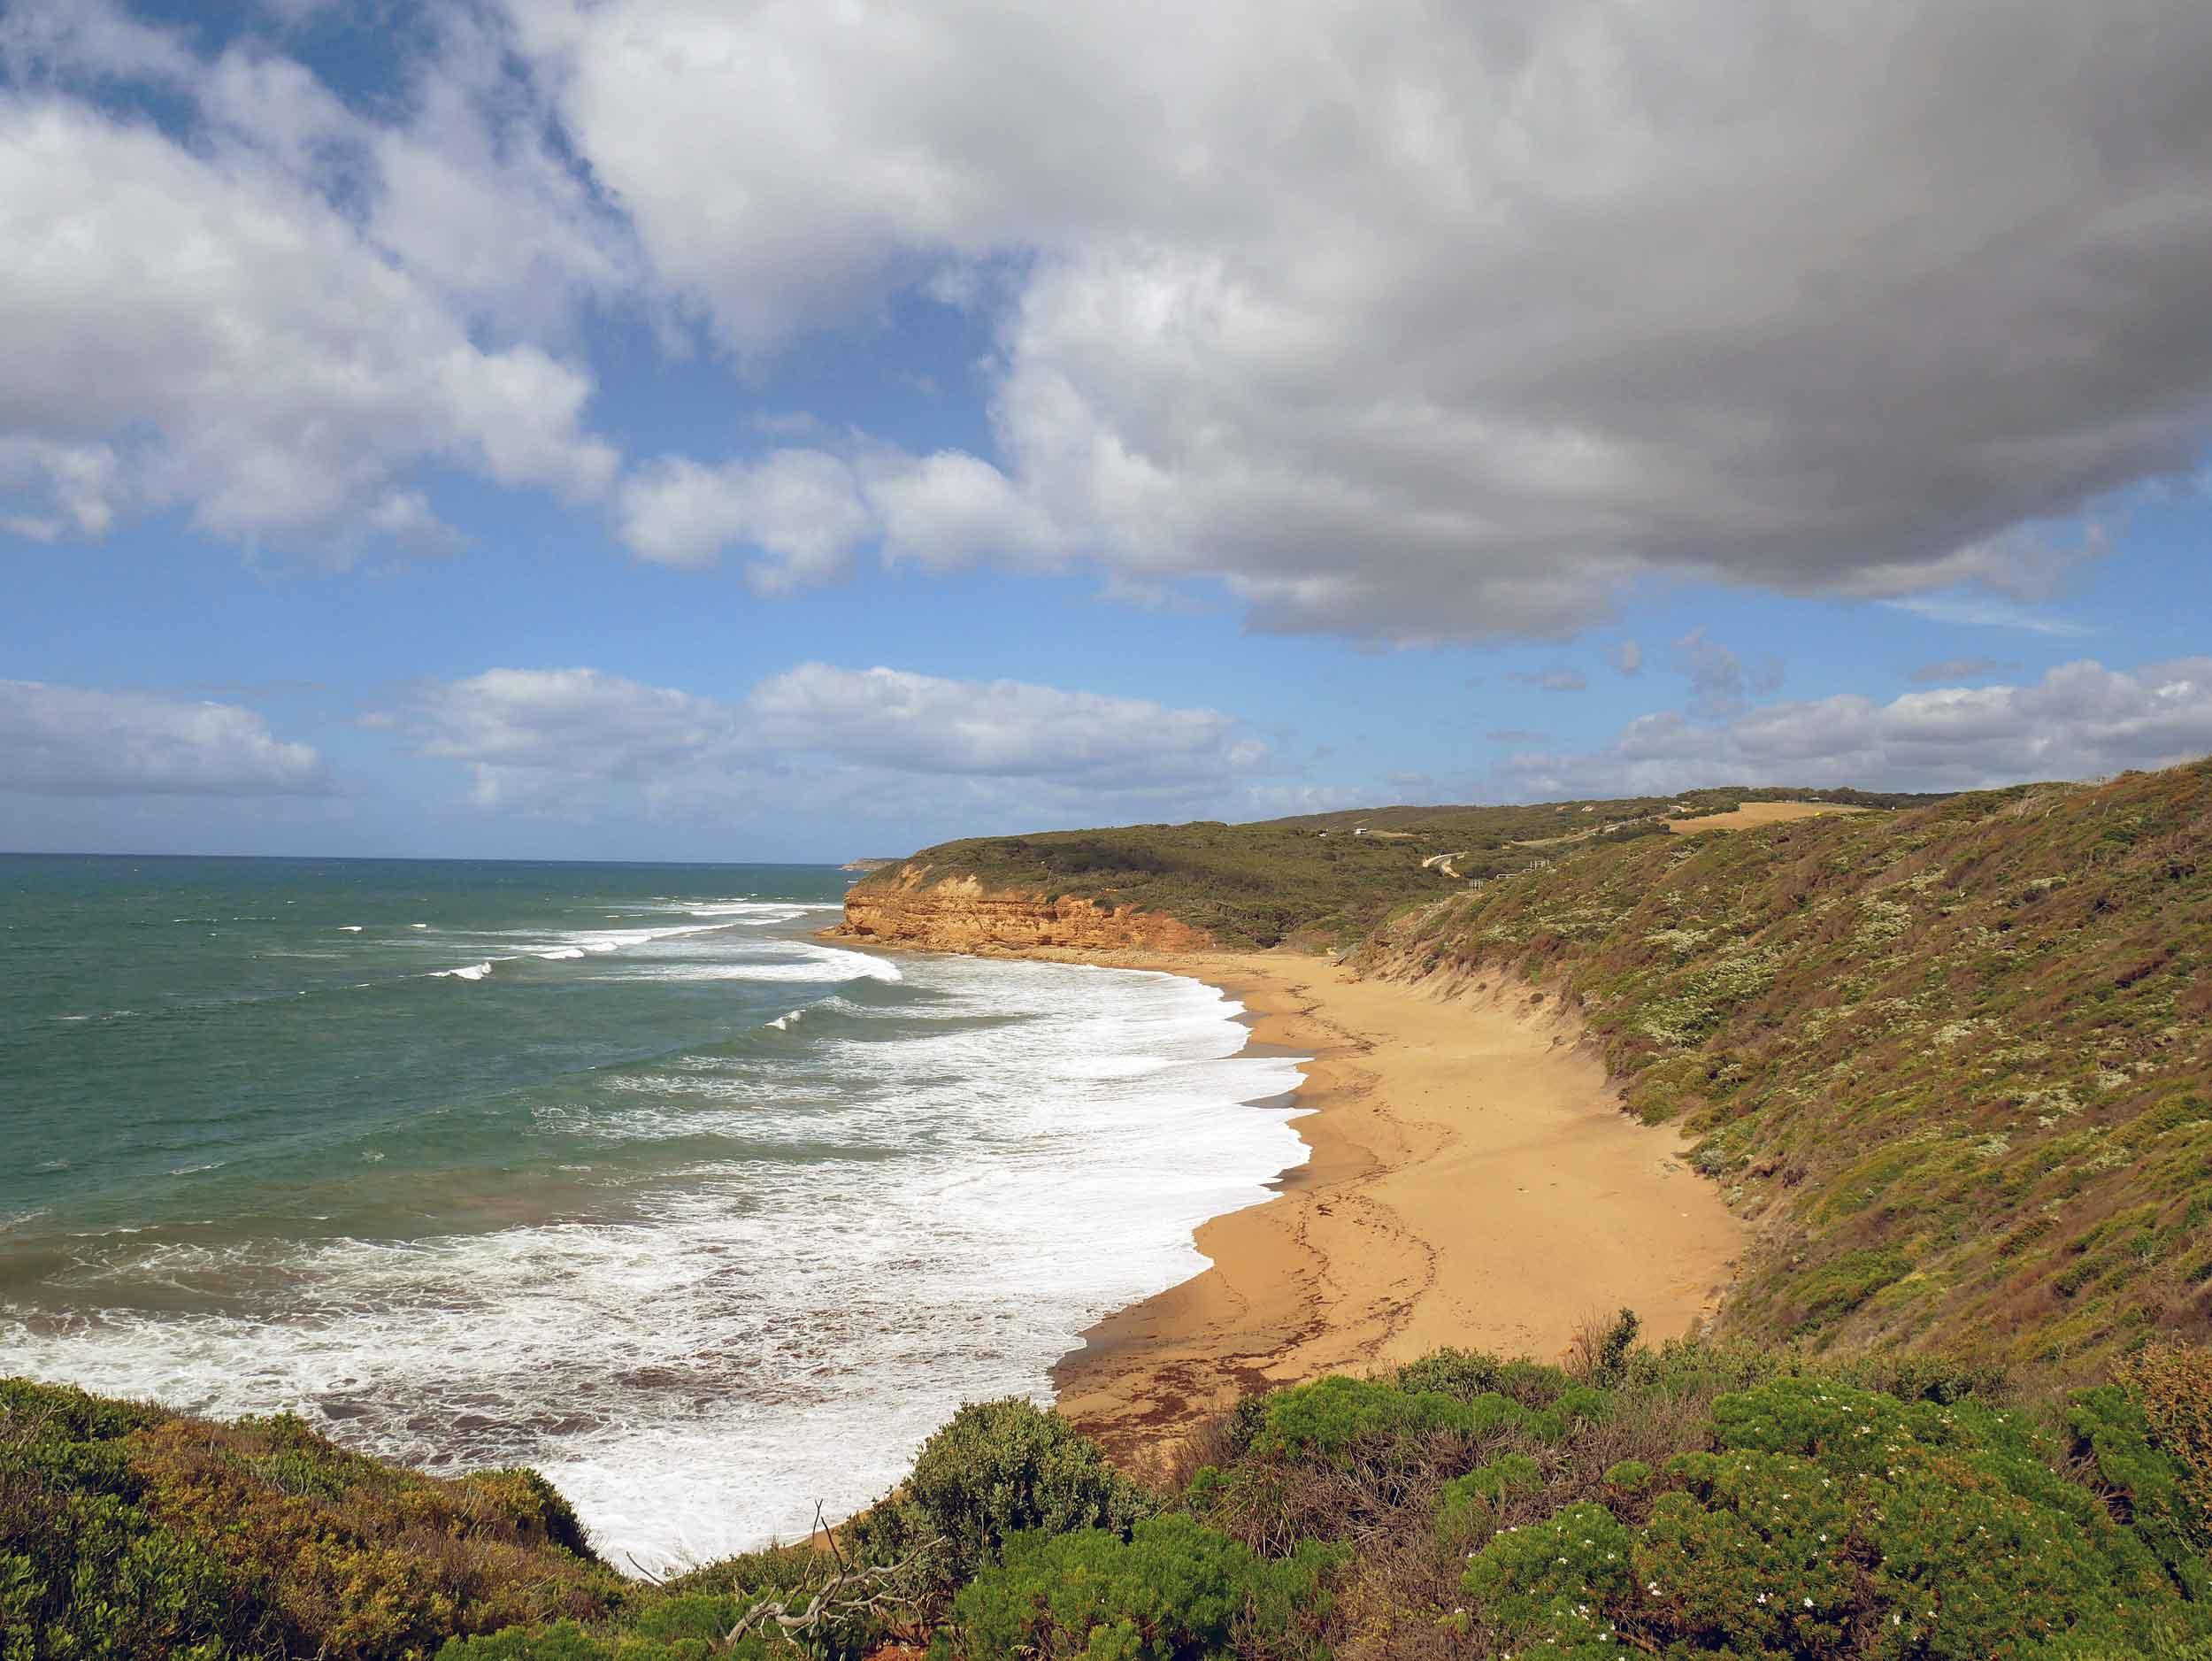 Bells Beach is a surfer's paradise (Jan 24).